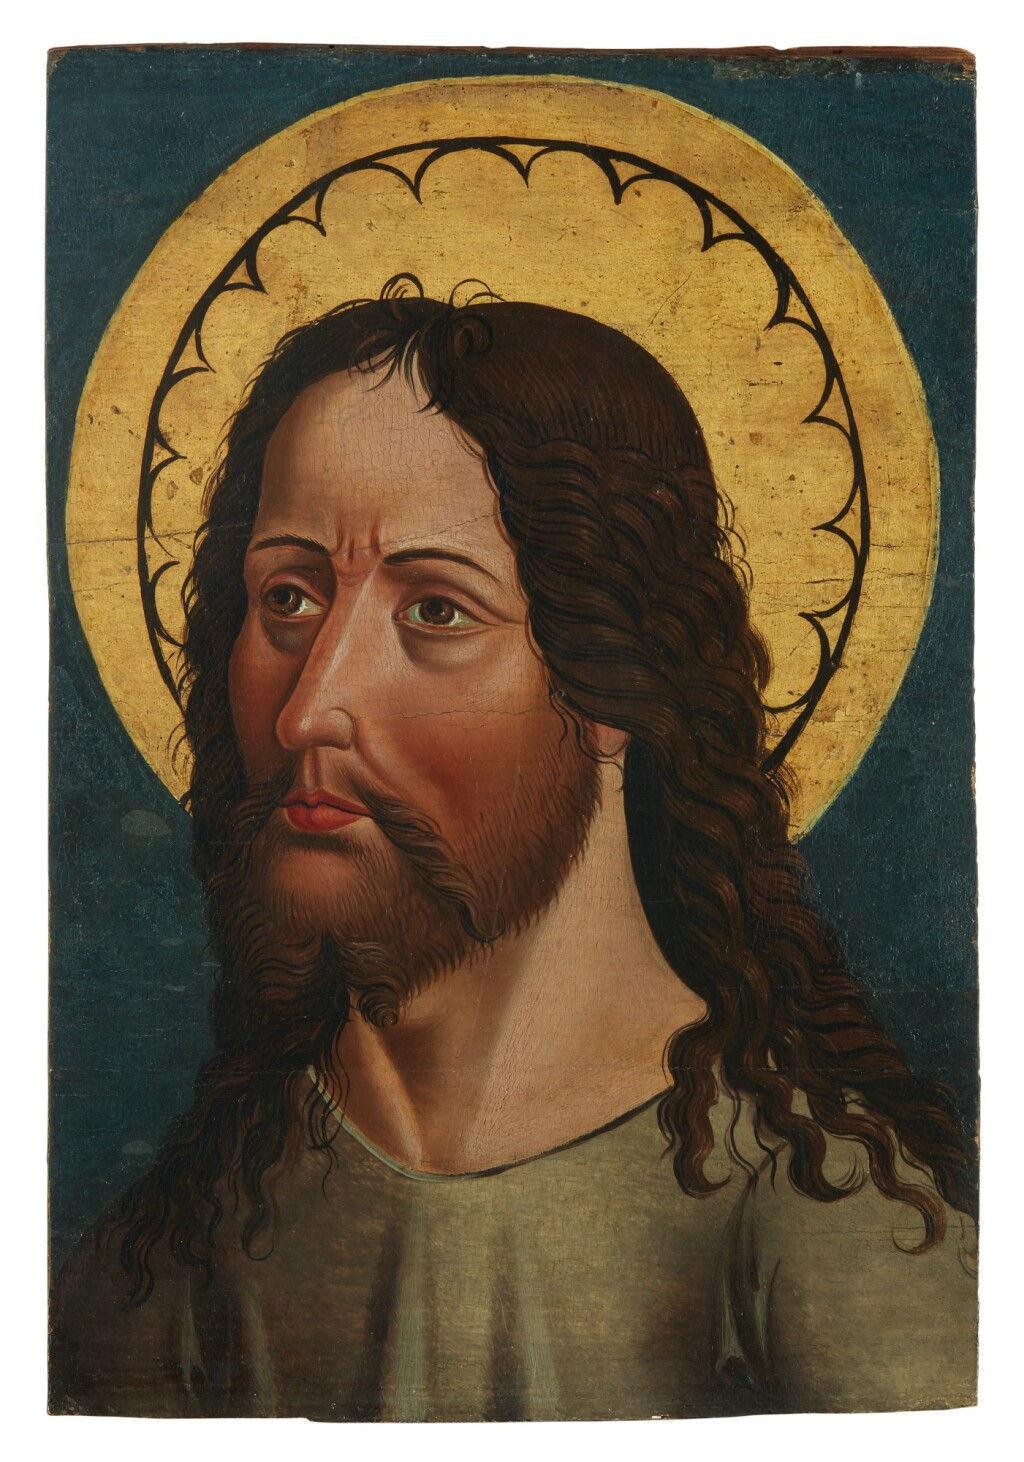 SWISS SCHOOL, CIRCA 1500   HEAD OF CHRIST